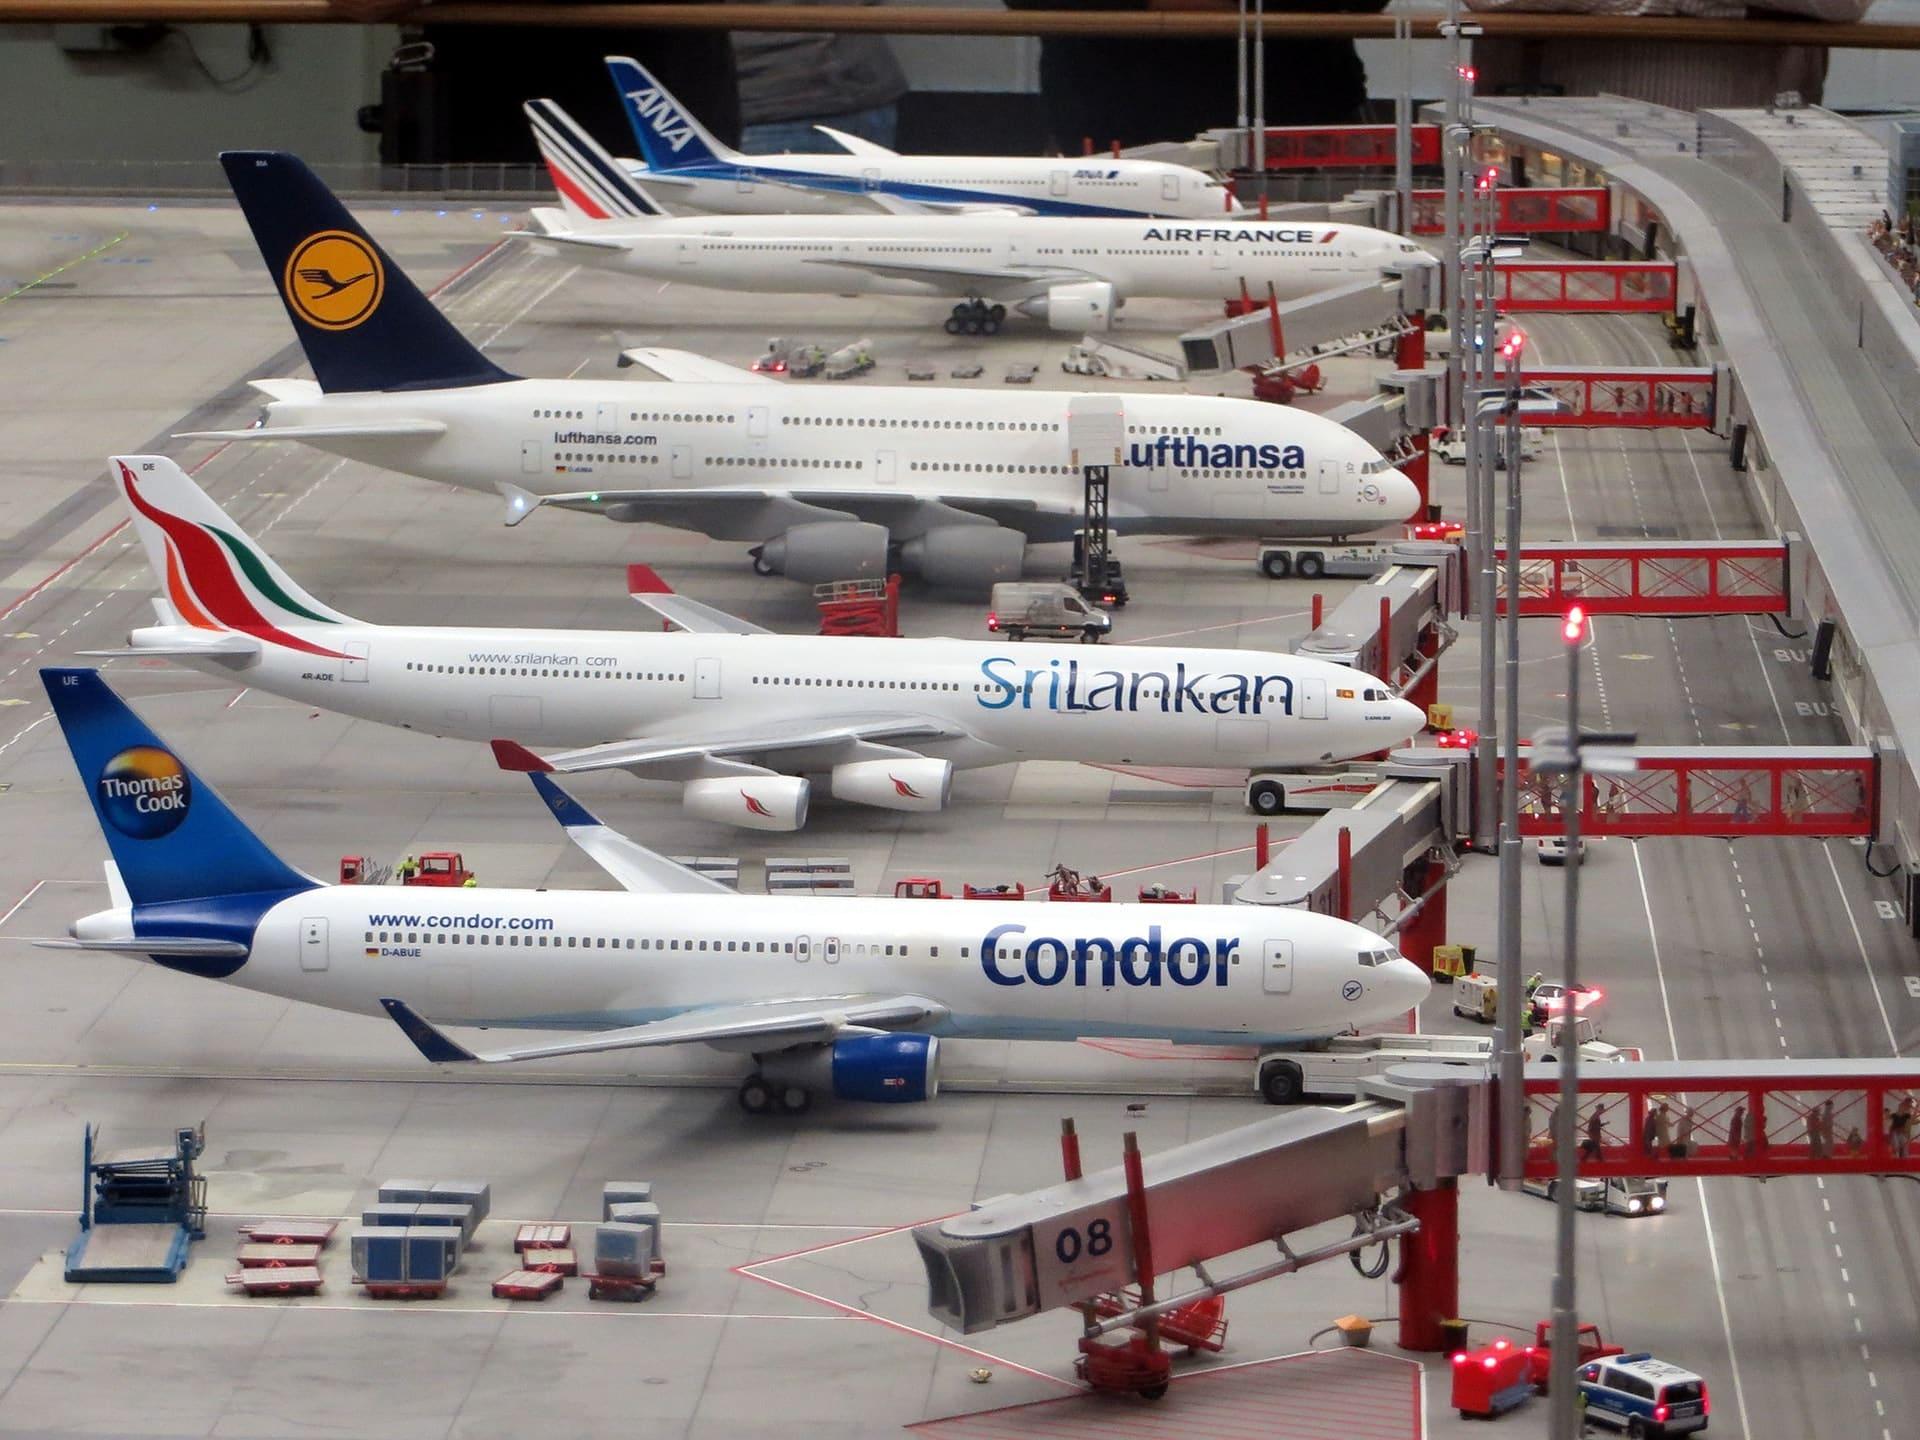 Model Aeroplanes